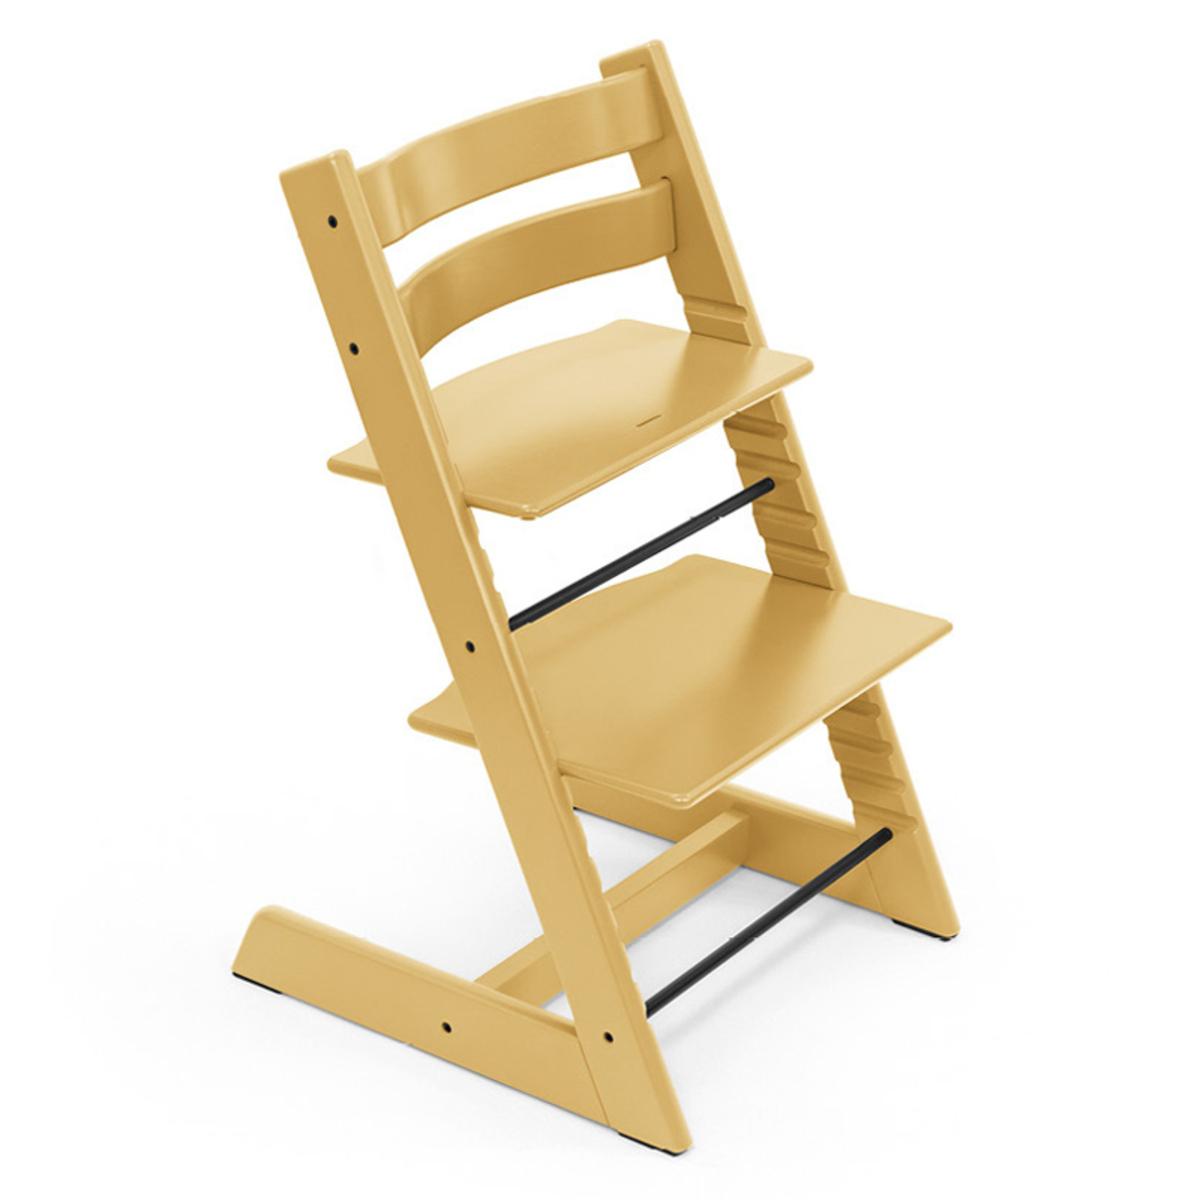 Chaise haute Chaise Haute Tripp Trapp - Jaune Tournesol Chaise Haute Tripp Trapp - Jaune Tournesol